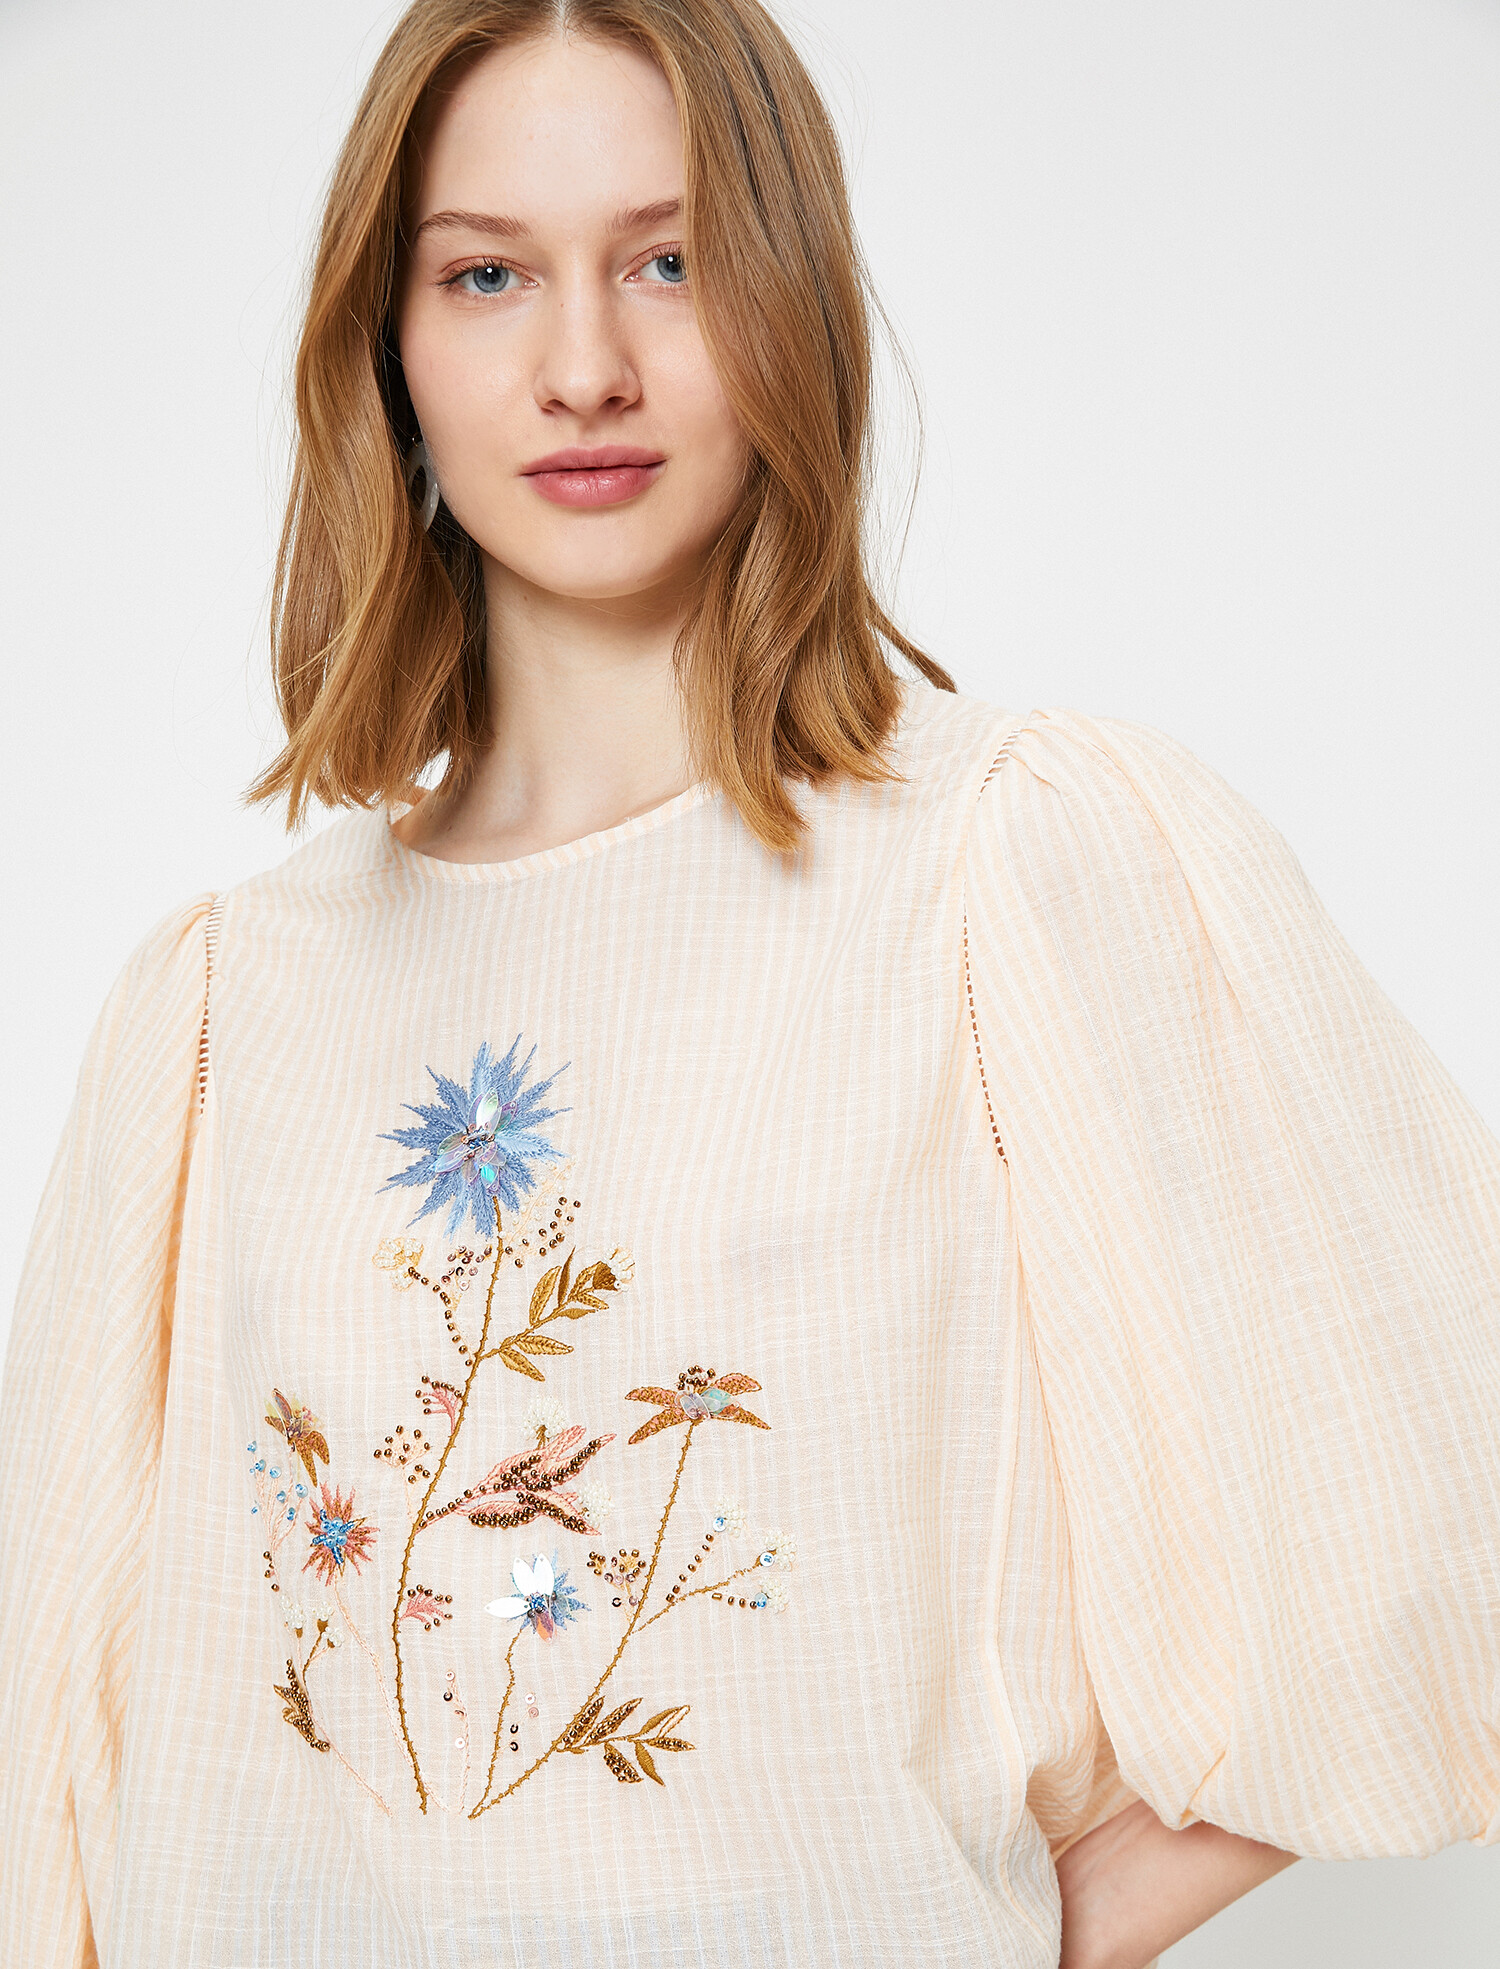 El Emeği Bluz - Turuncu Çizgili